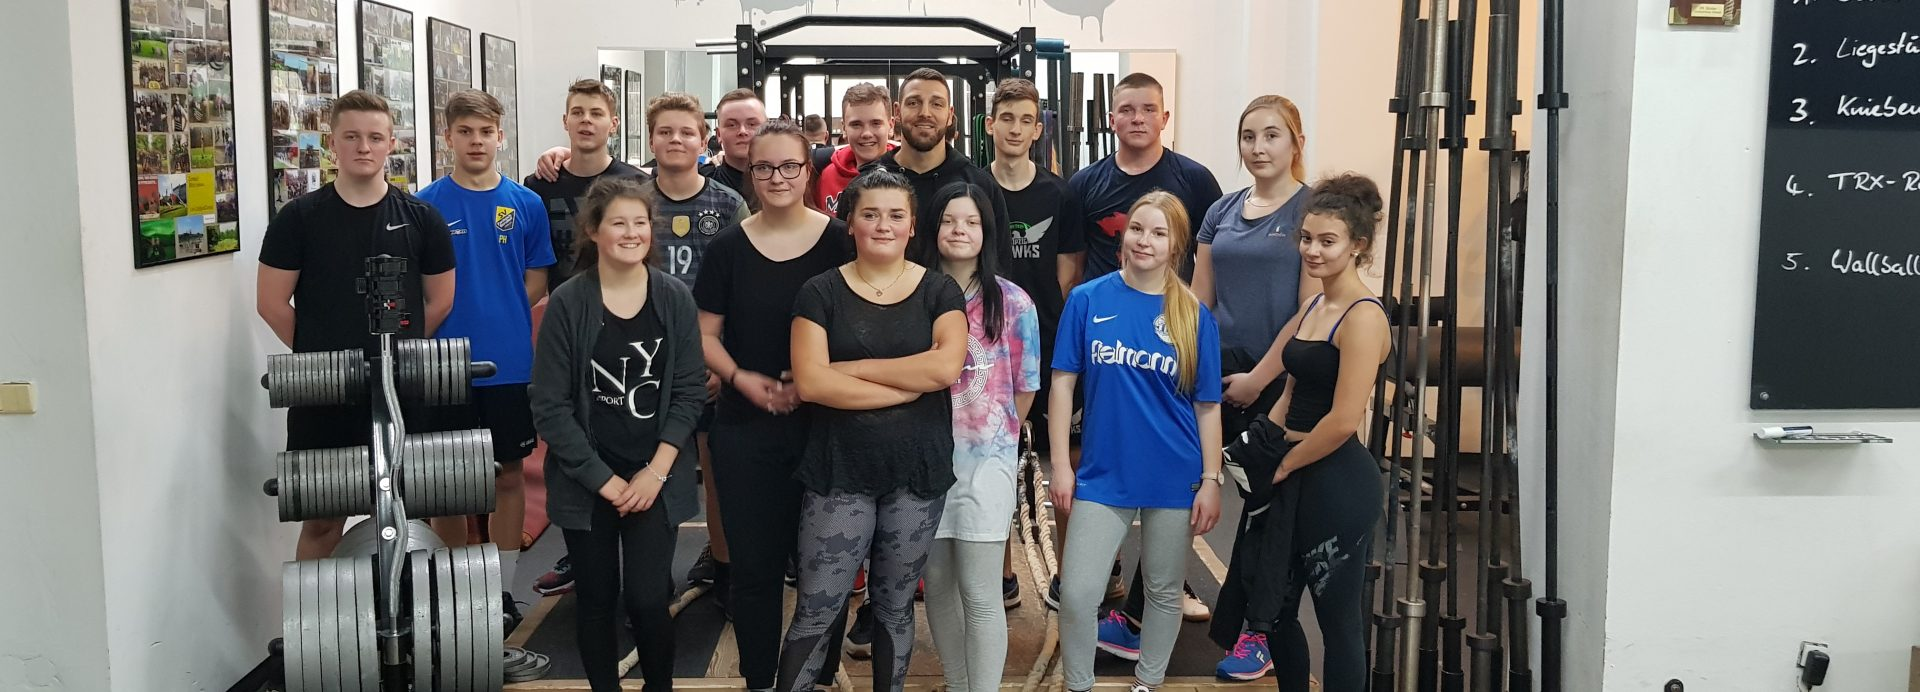 Sporttag im Headquarter des City-Bootcamps Leipzig